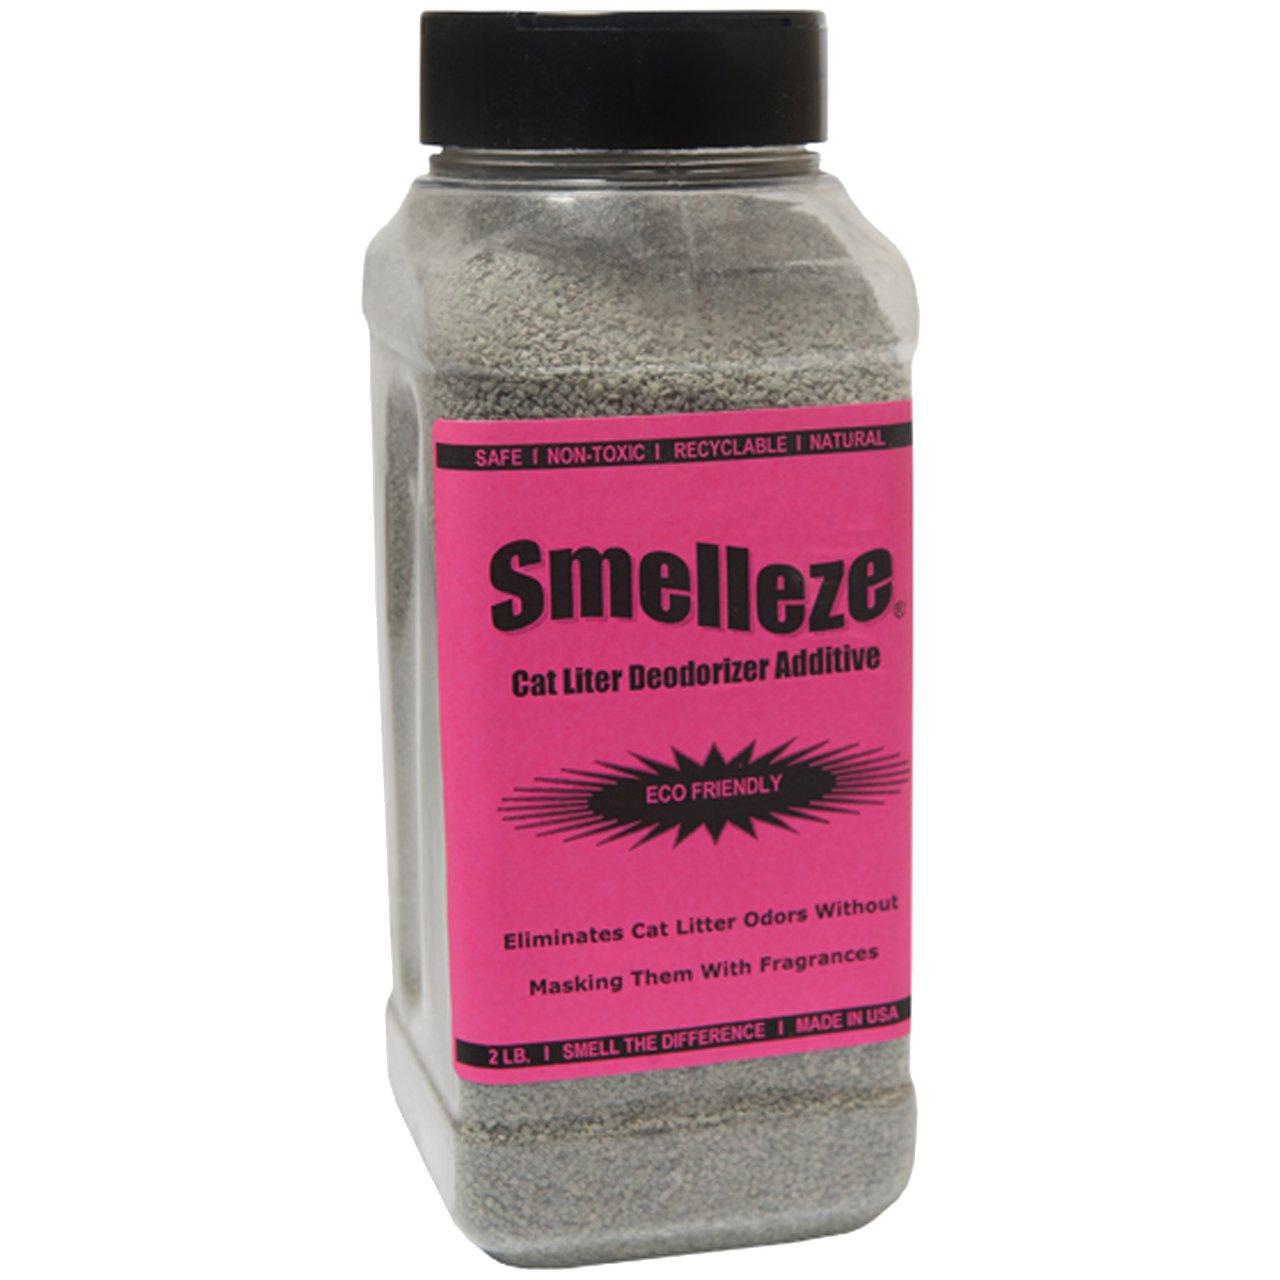 SMELLEZE Eco Cat Litter Odor Removal Additive: 50 lb. Granules Get Poop & Pee Stench Out Safely